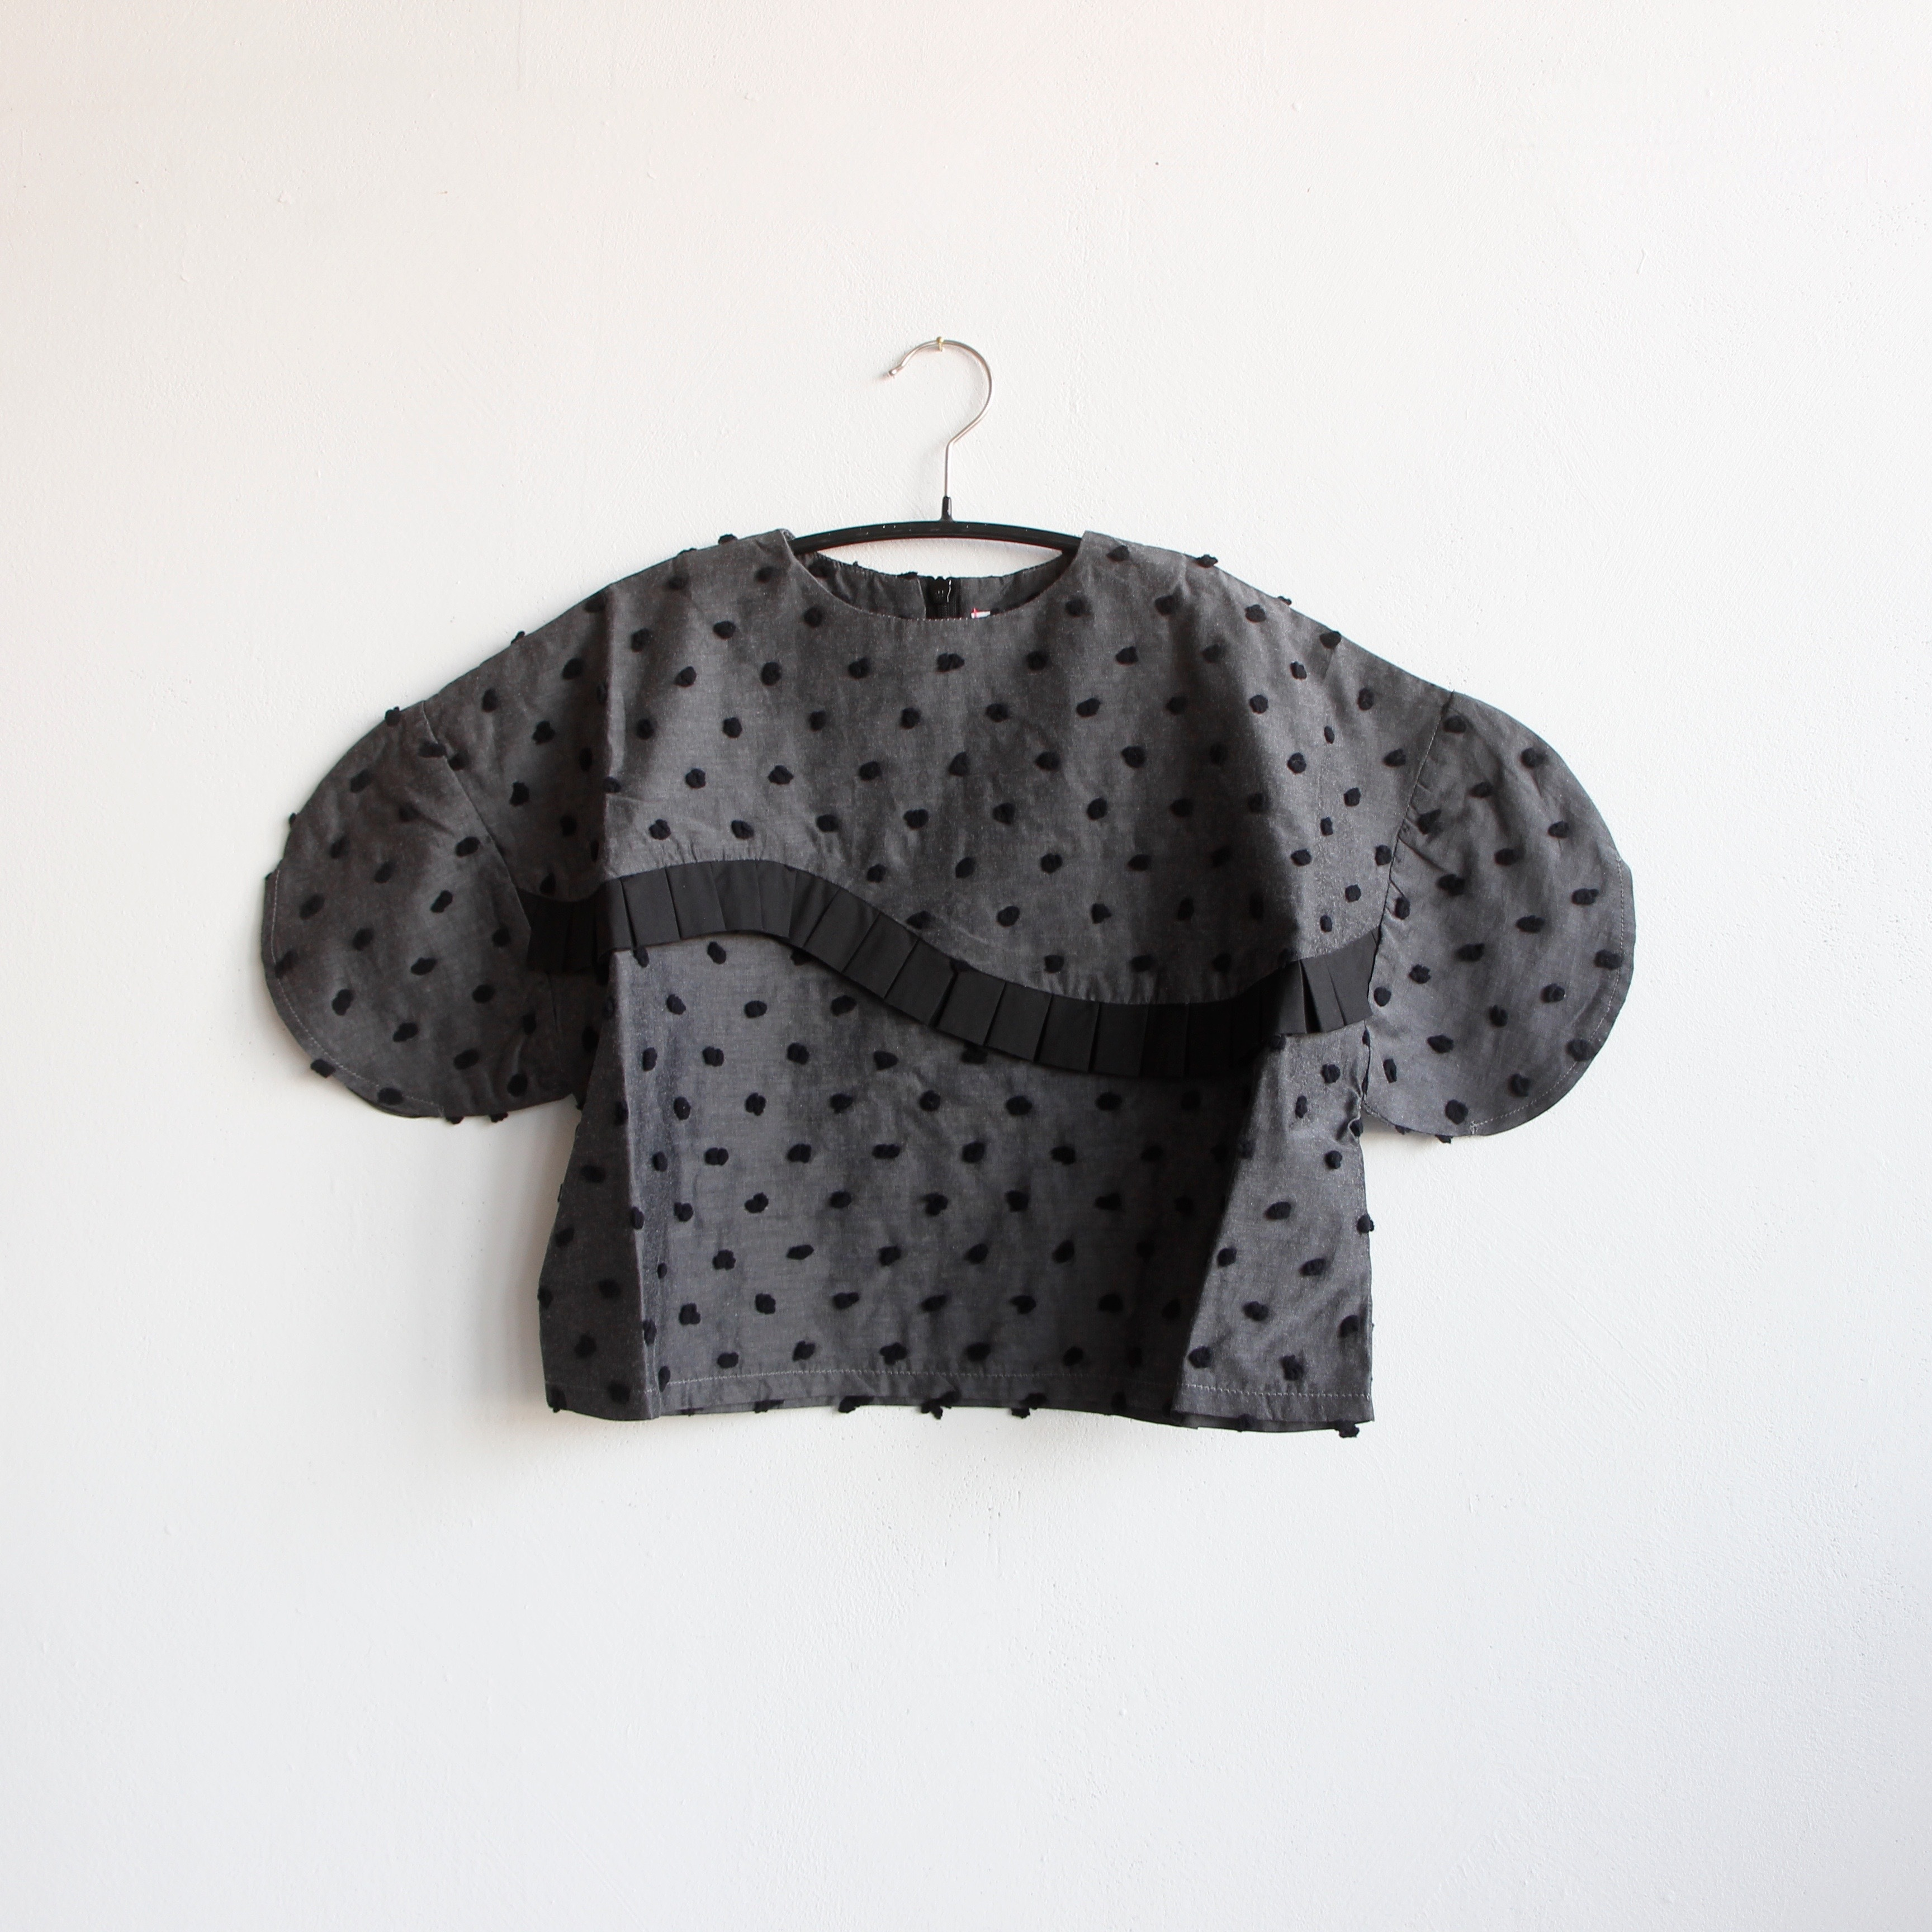 《frankygrow 2020SS》BONBON CUT JQ SWITCHING PLEATS TP / gray × black bonbon / S・M・L